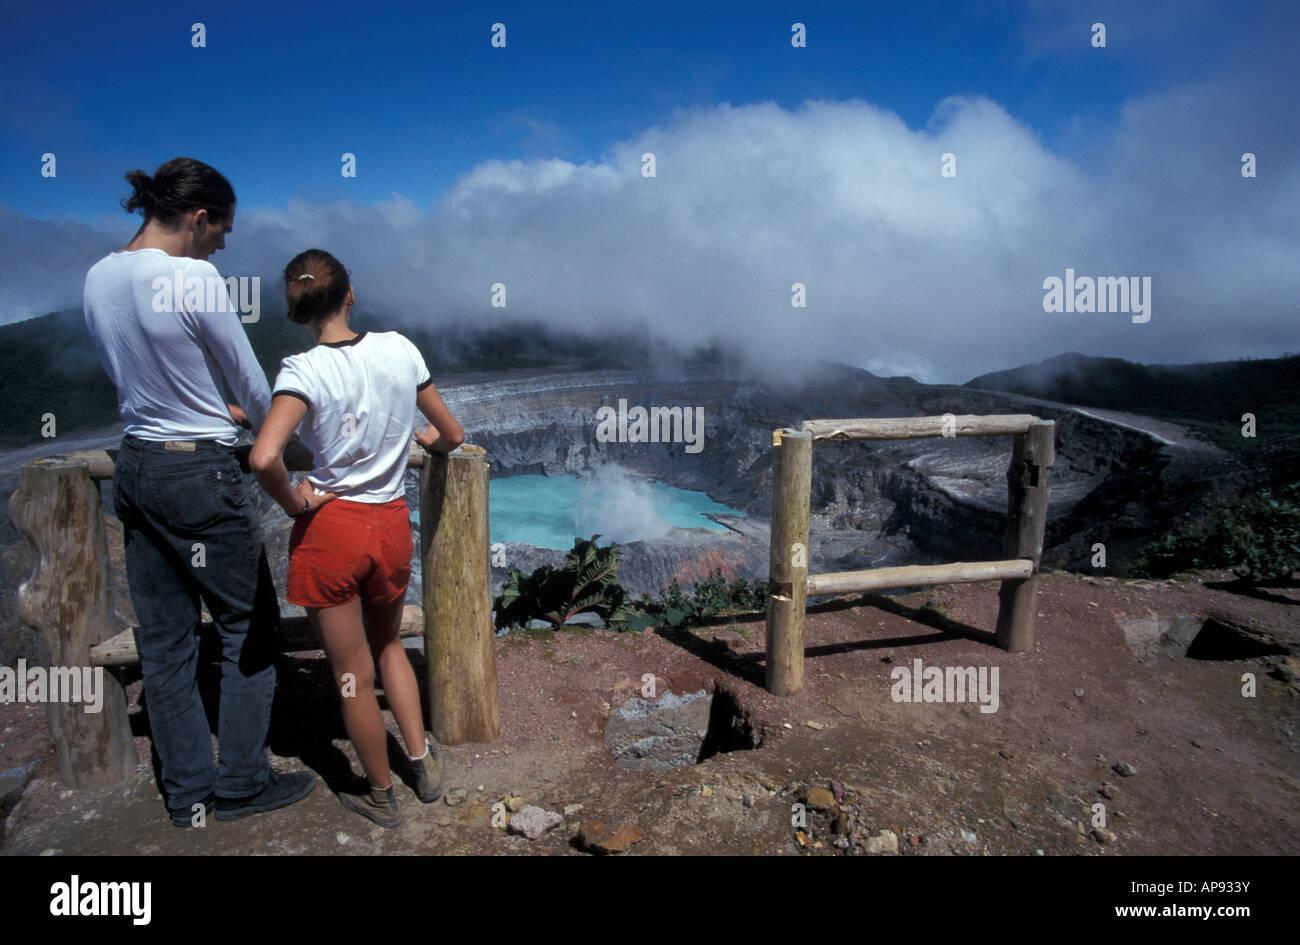 Young couple looking into the steaming crater of active Poas Volcano, Parque Nacional Volcan Poas, Costa Rica - Stock Image